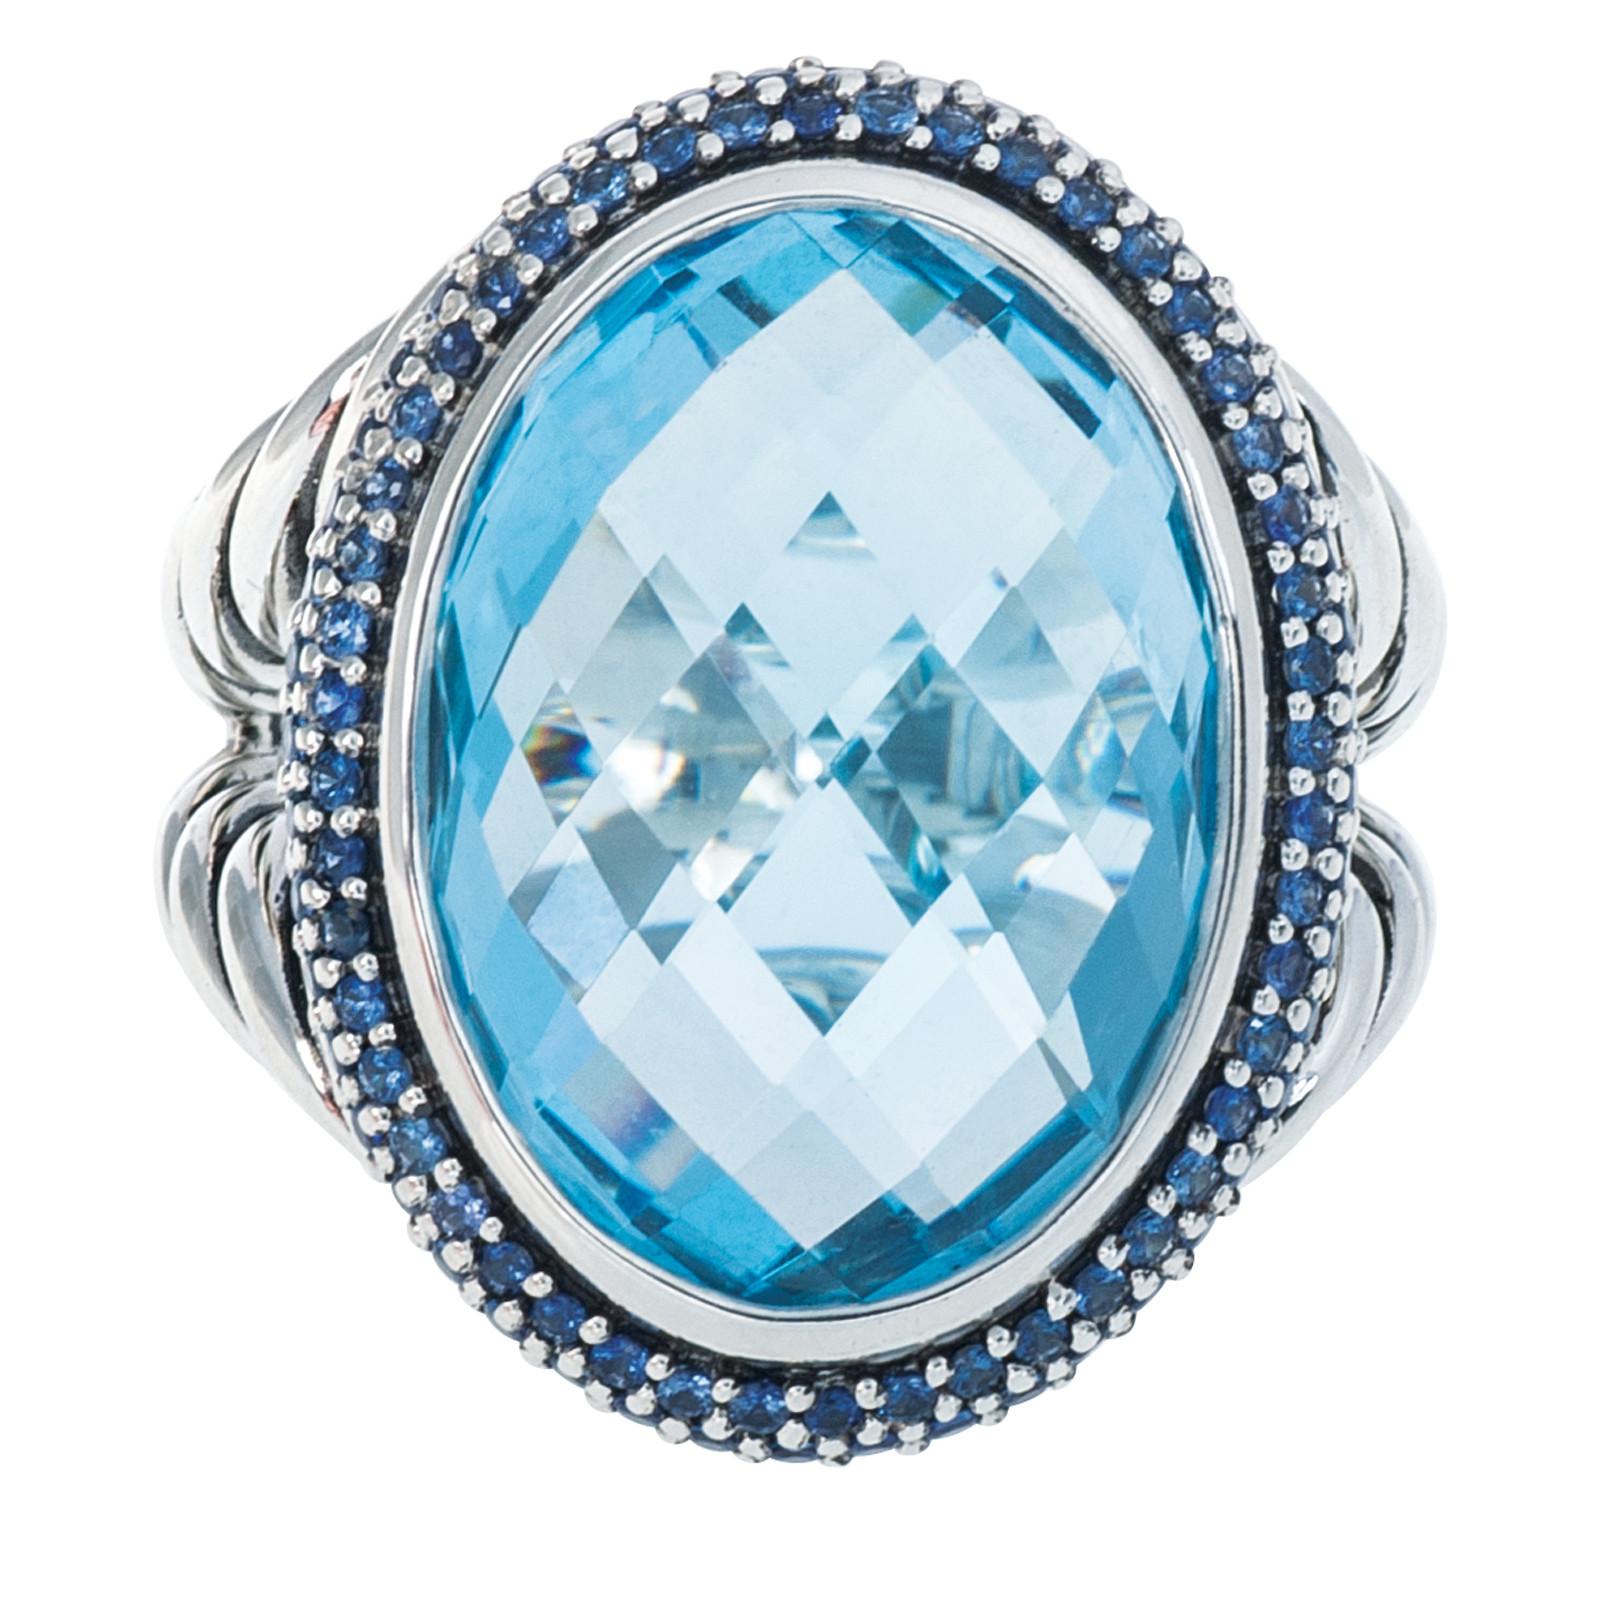 Viintage David Yurman Topaz & 1.14 CTW Sapphire Ring